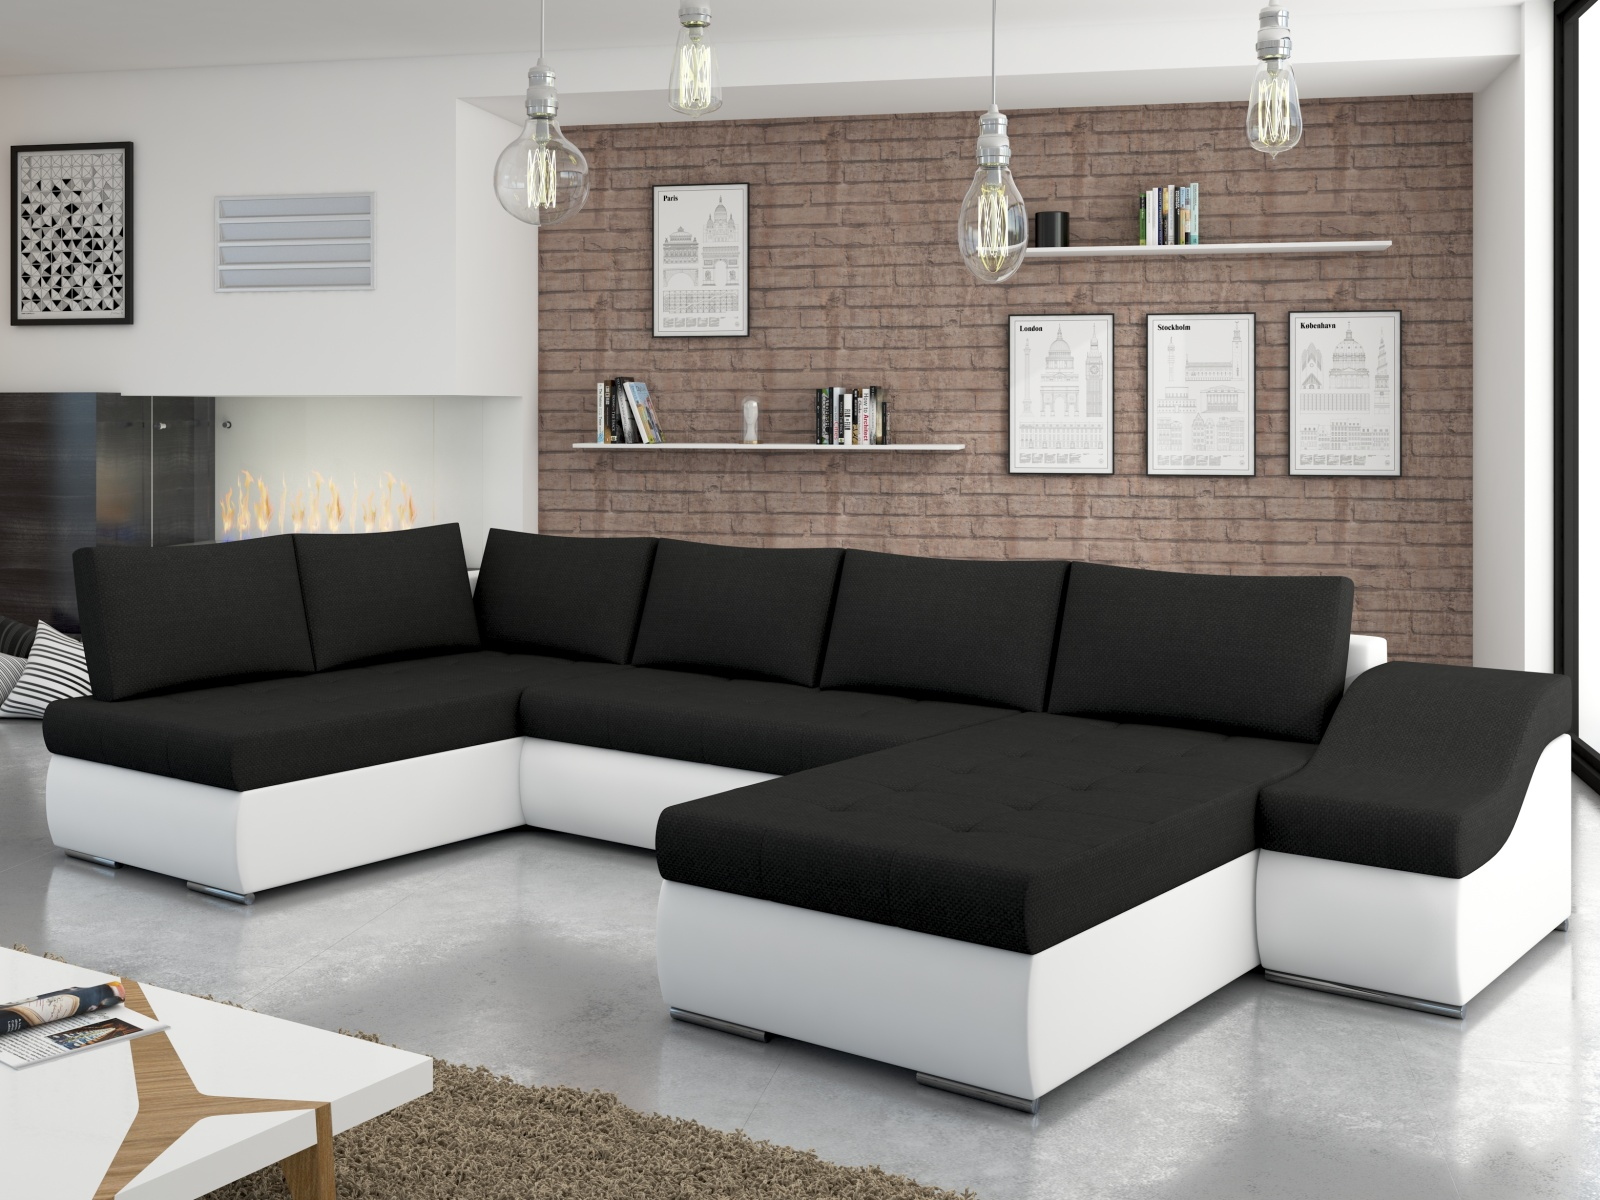 ELTAP Rohová sedačka GIOVANNI 02, černá látka/bílá ekokůže